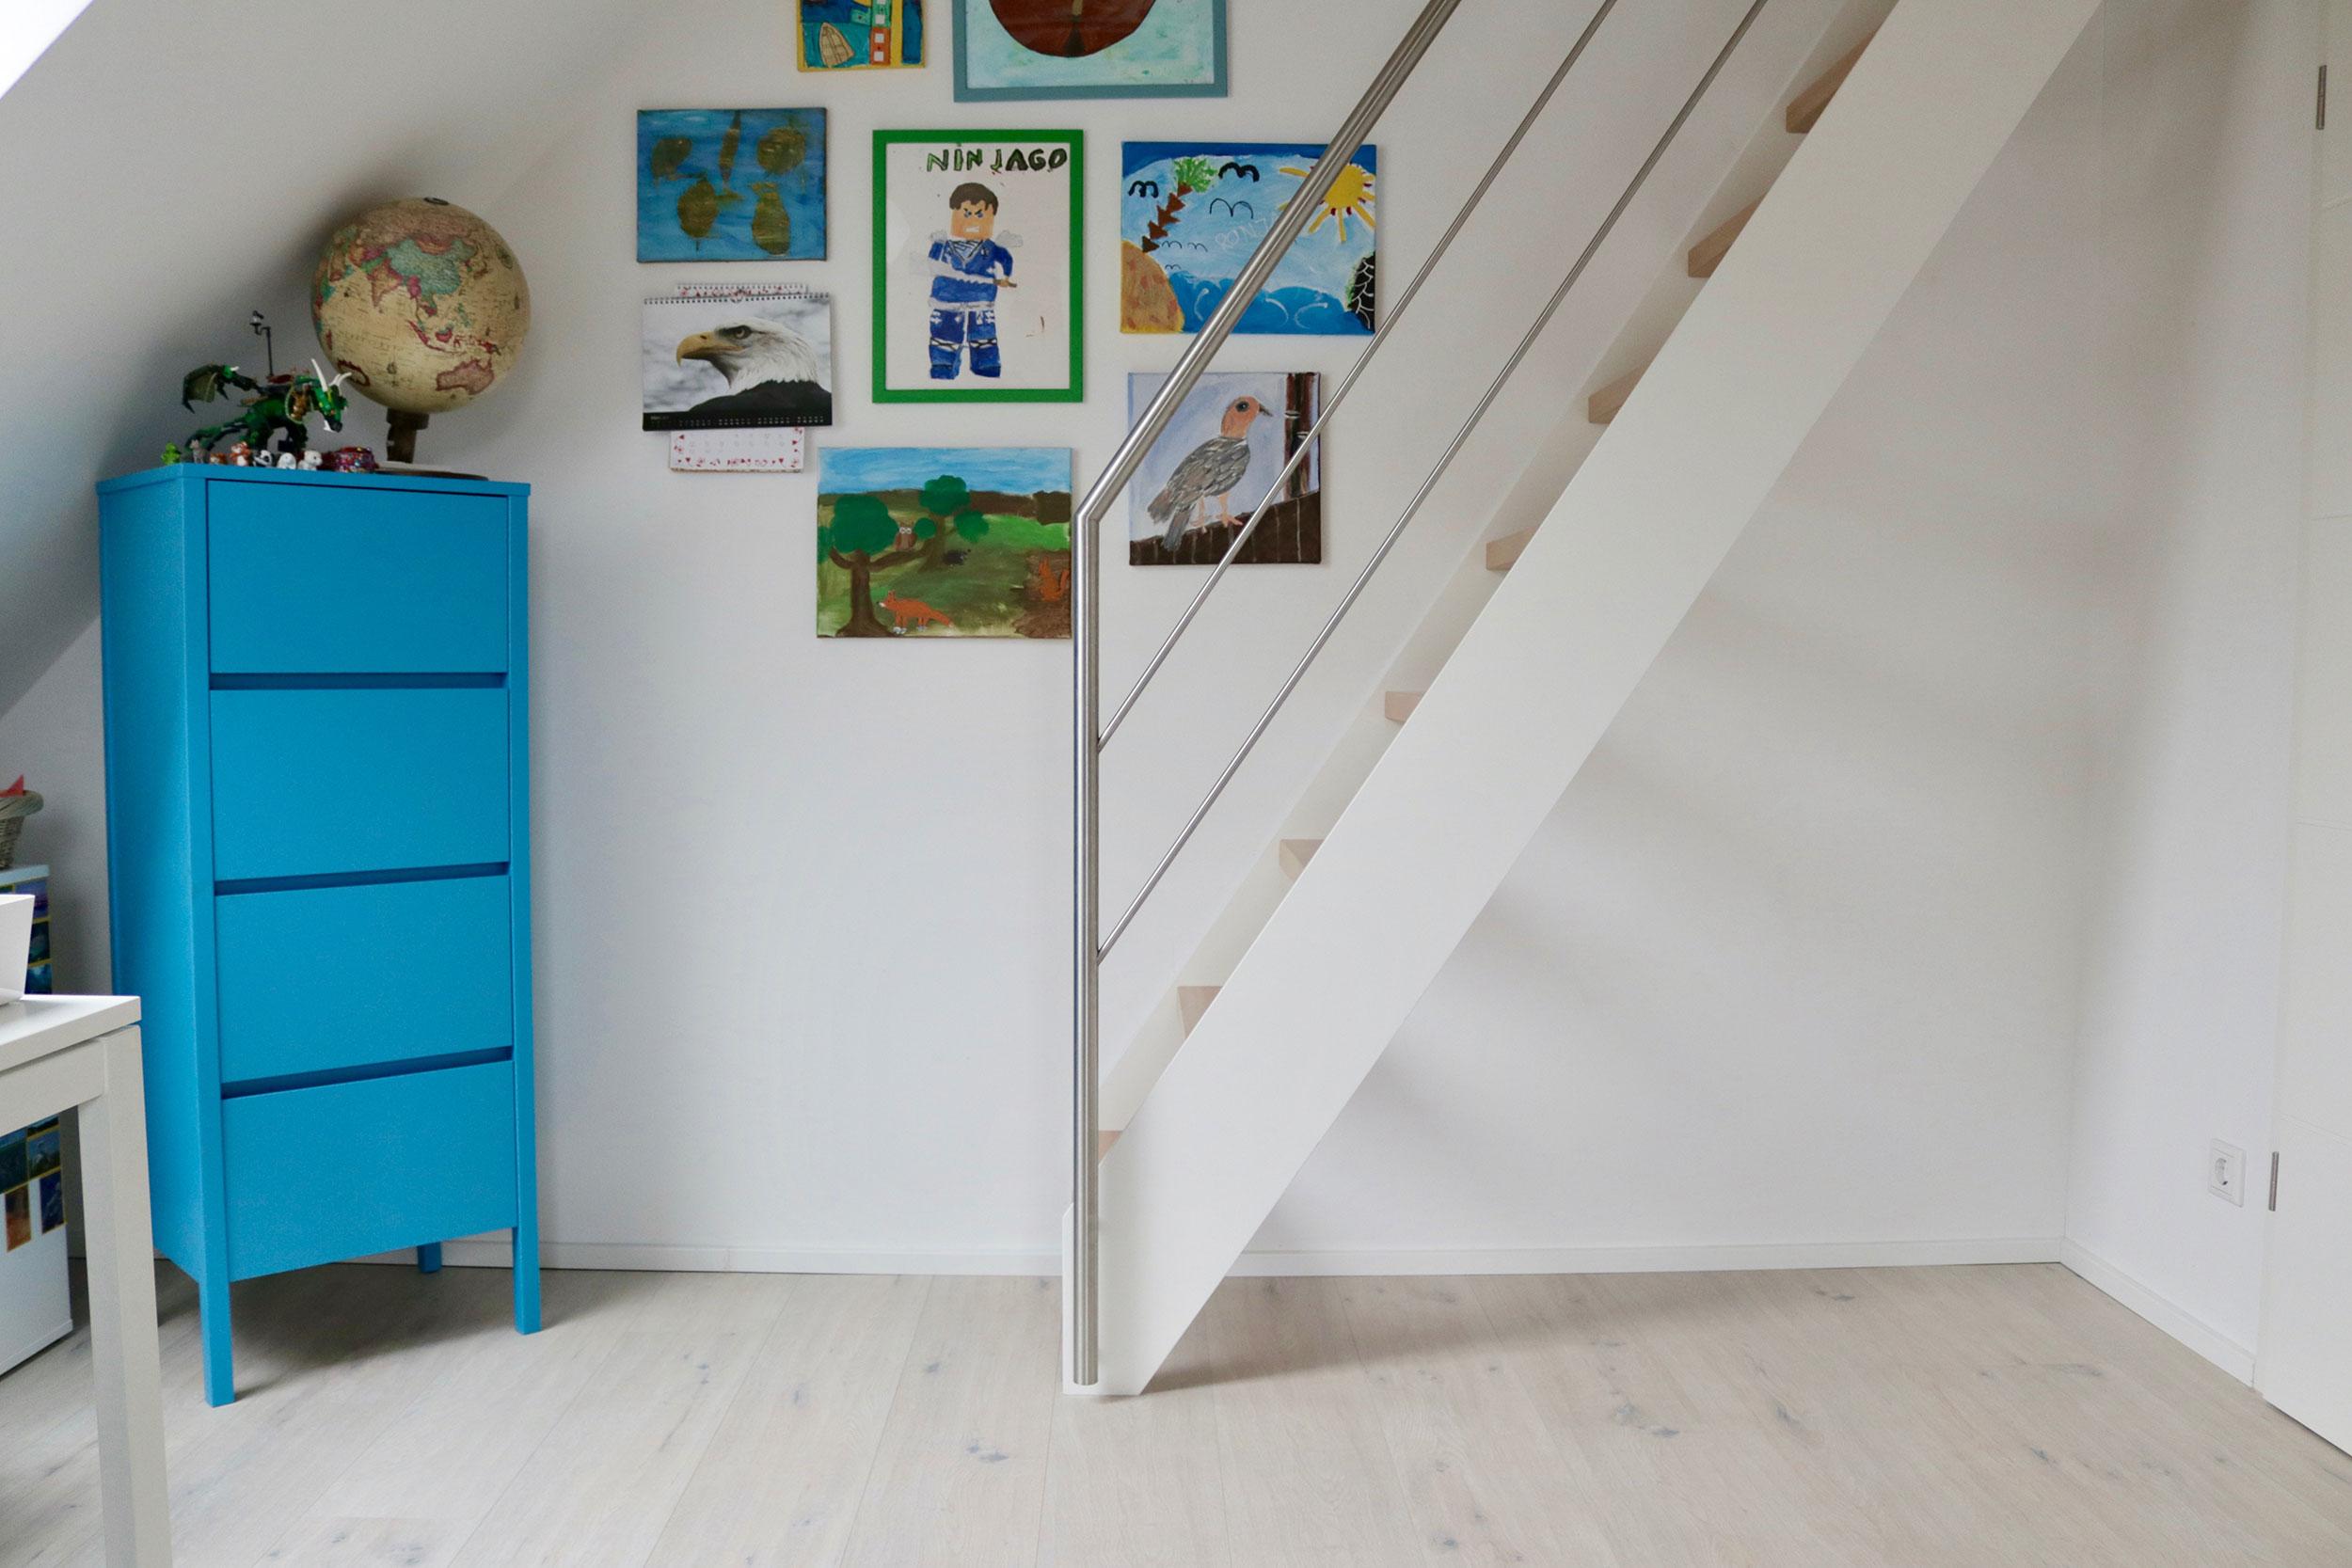 steiltreppe vom kinderzimmer ins dachgeschoss treppenbau. Black Bedroom Furniture Sets. Home Design Ideas